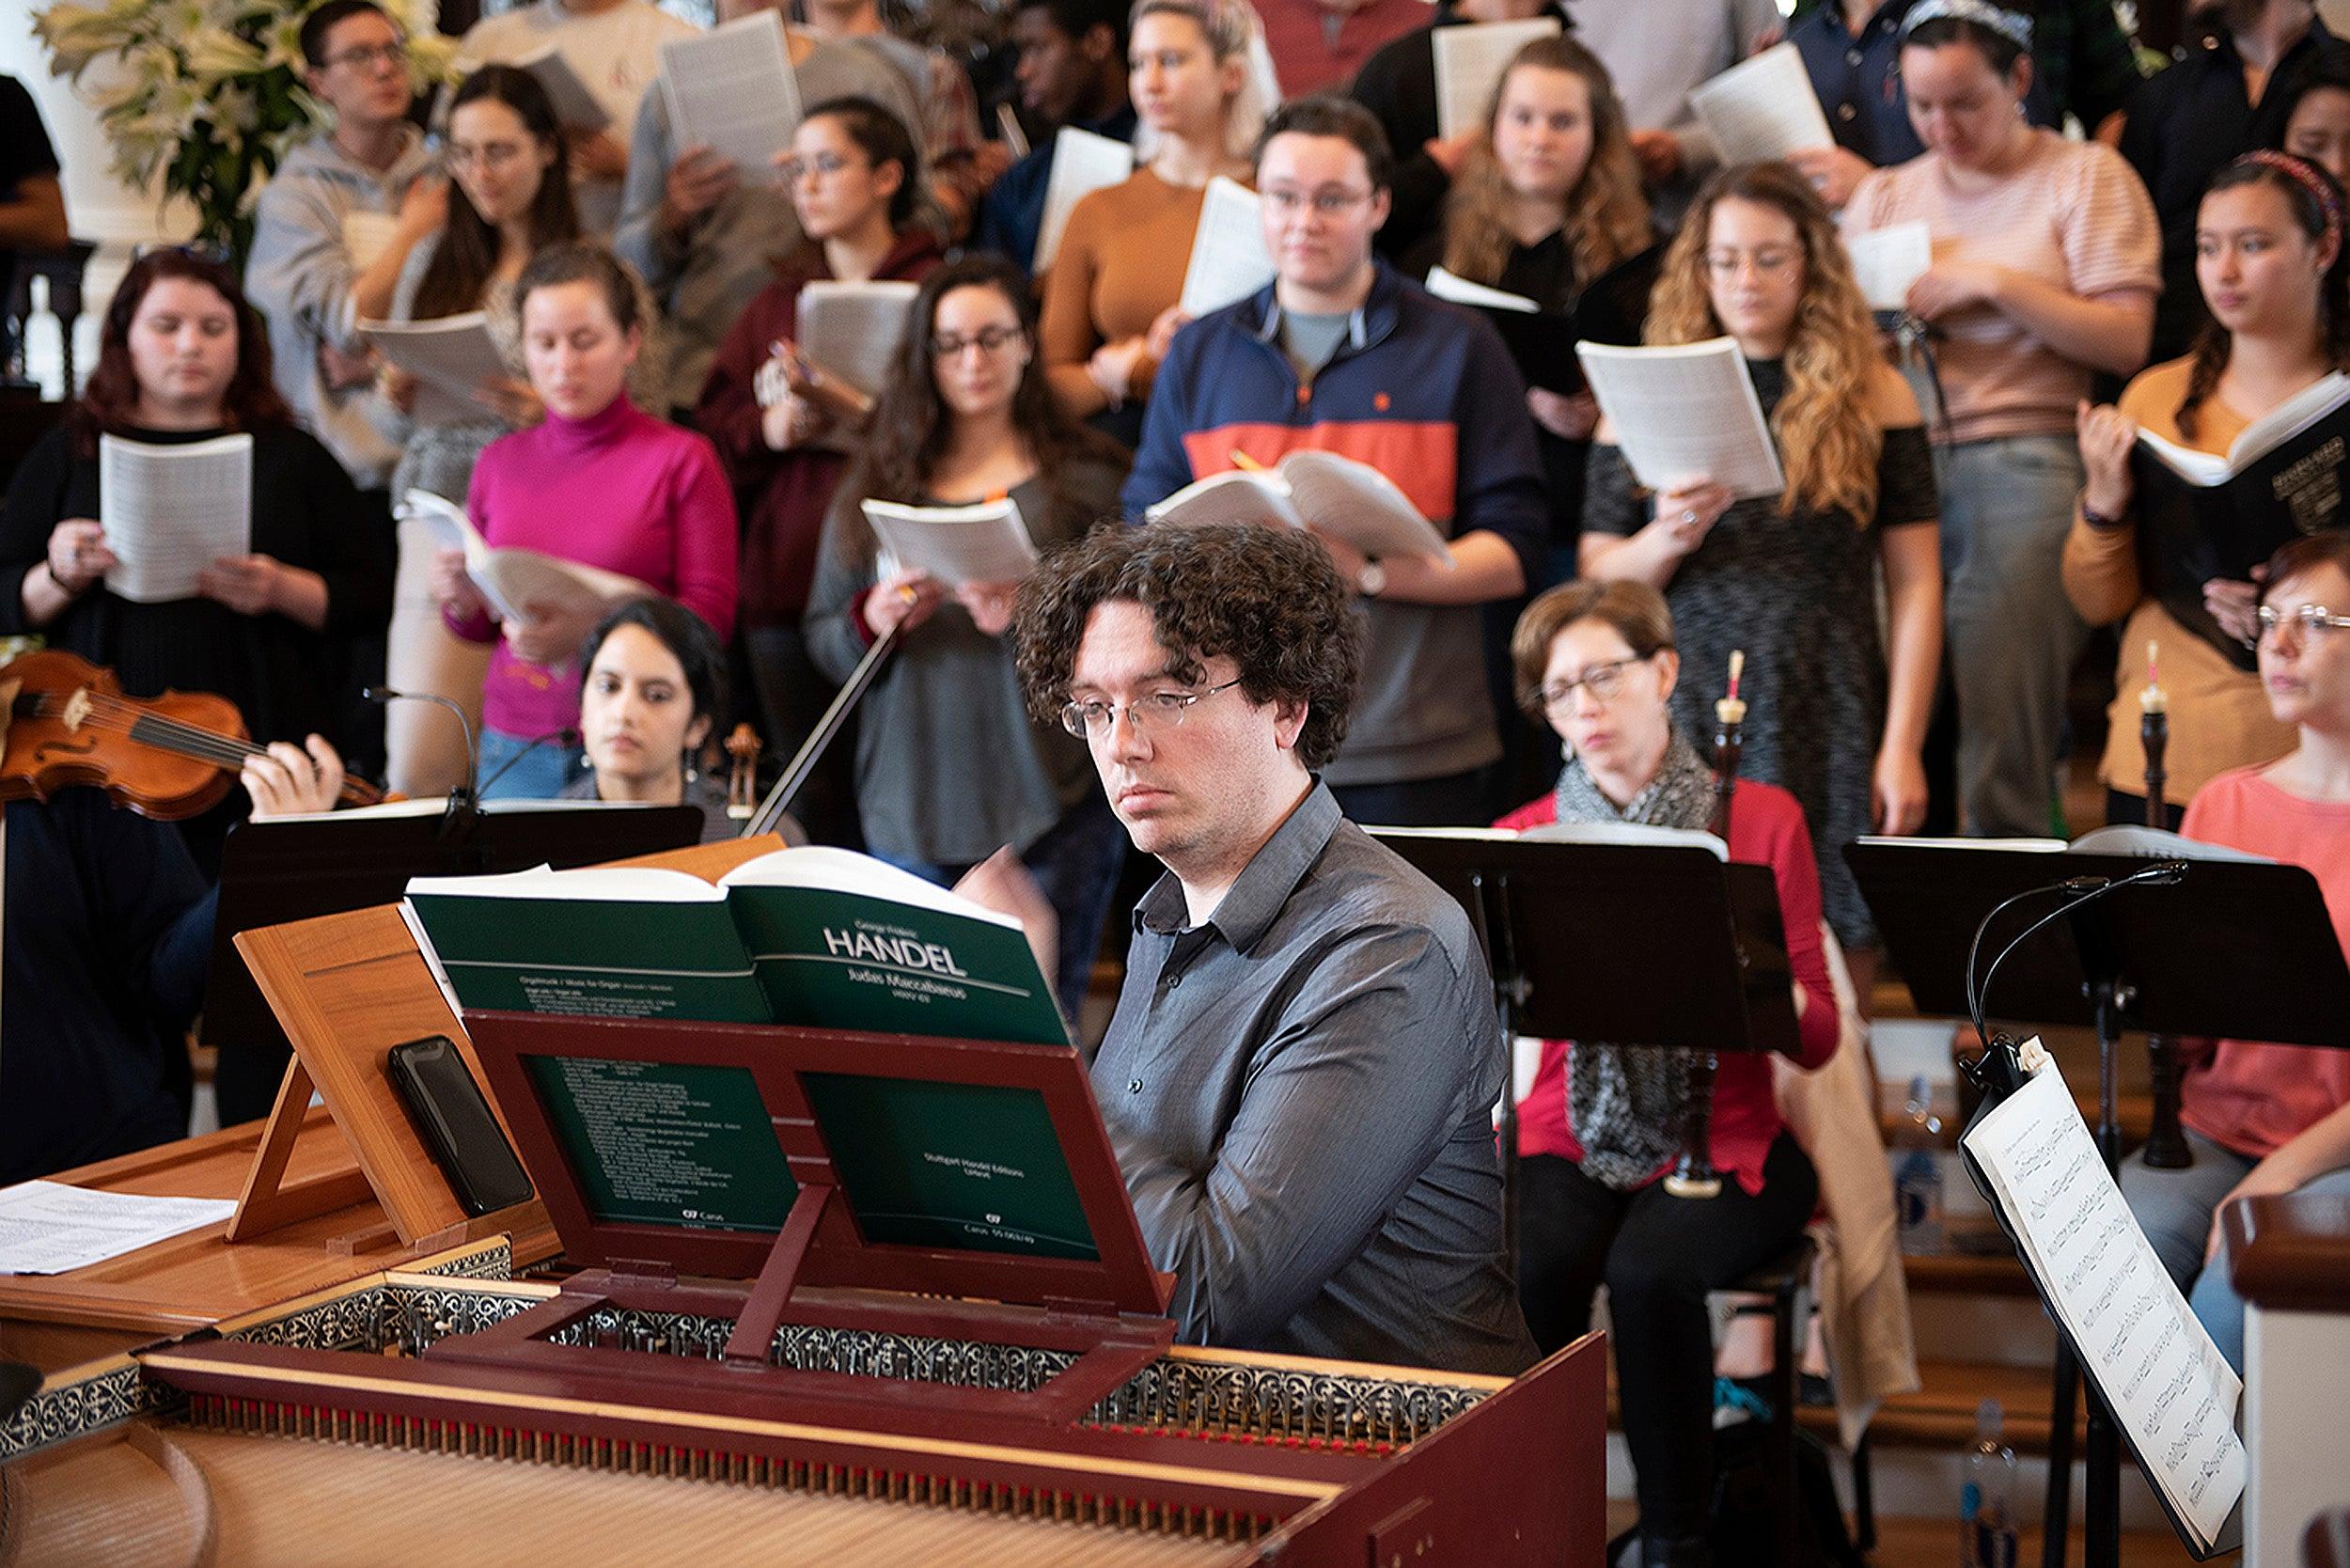 Tom Sheehan plays the harpsichord